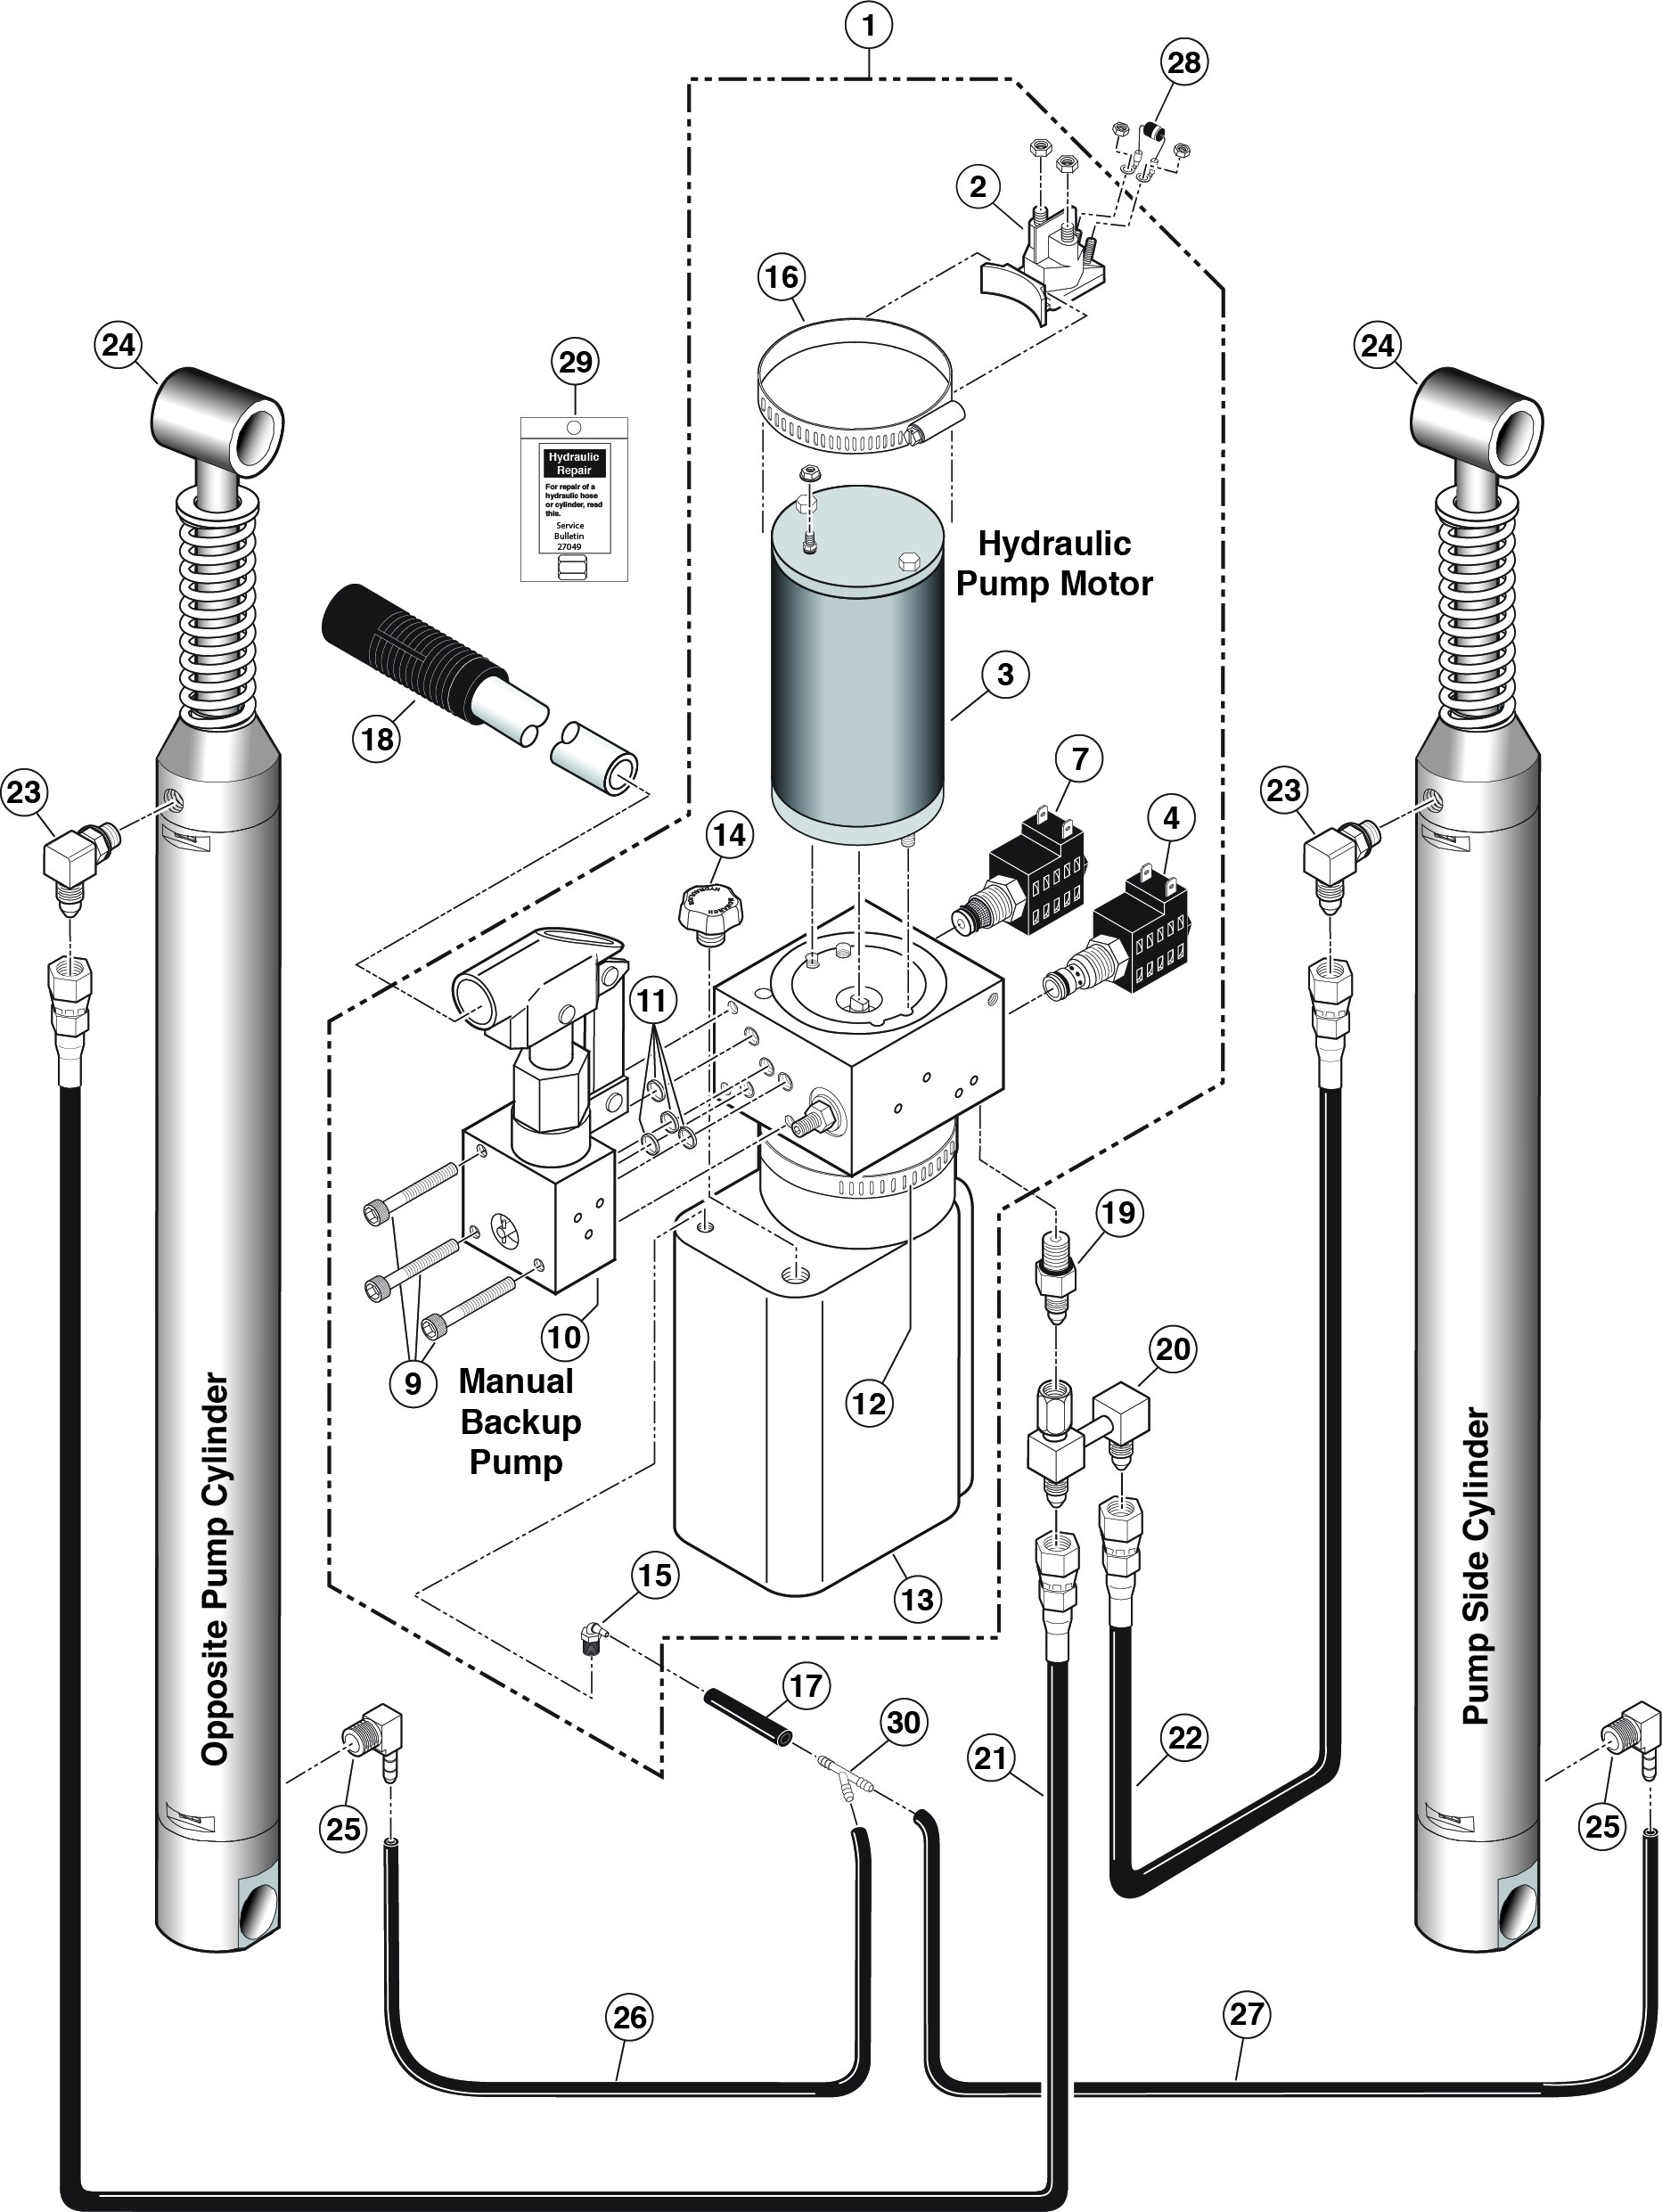 Aluminum Window Parts Diagram Braunability Wheelchair Lift Parts Vista 2 Series Da Of Aluminum Window Parts Diagram